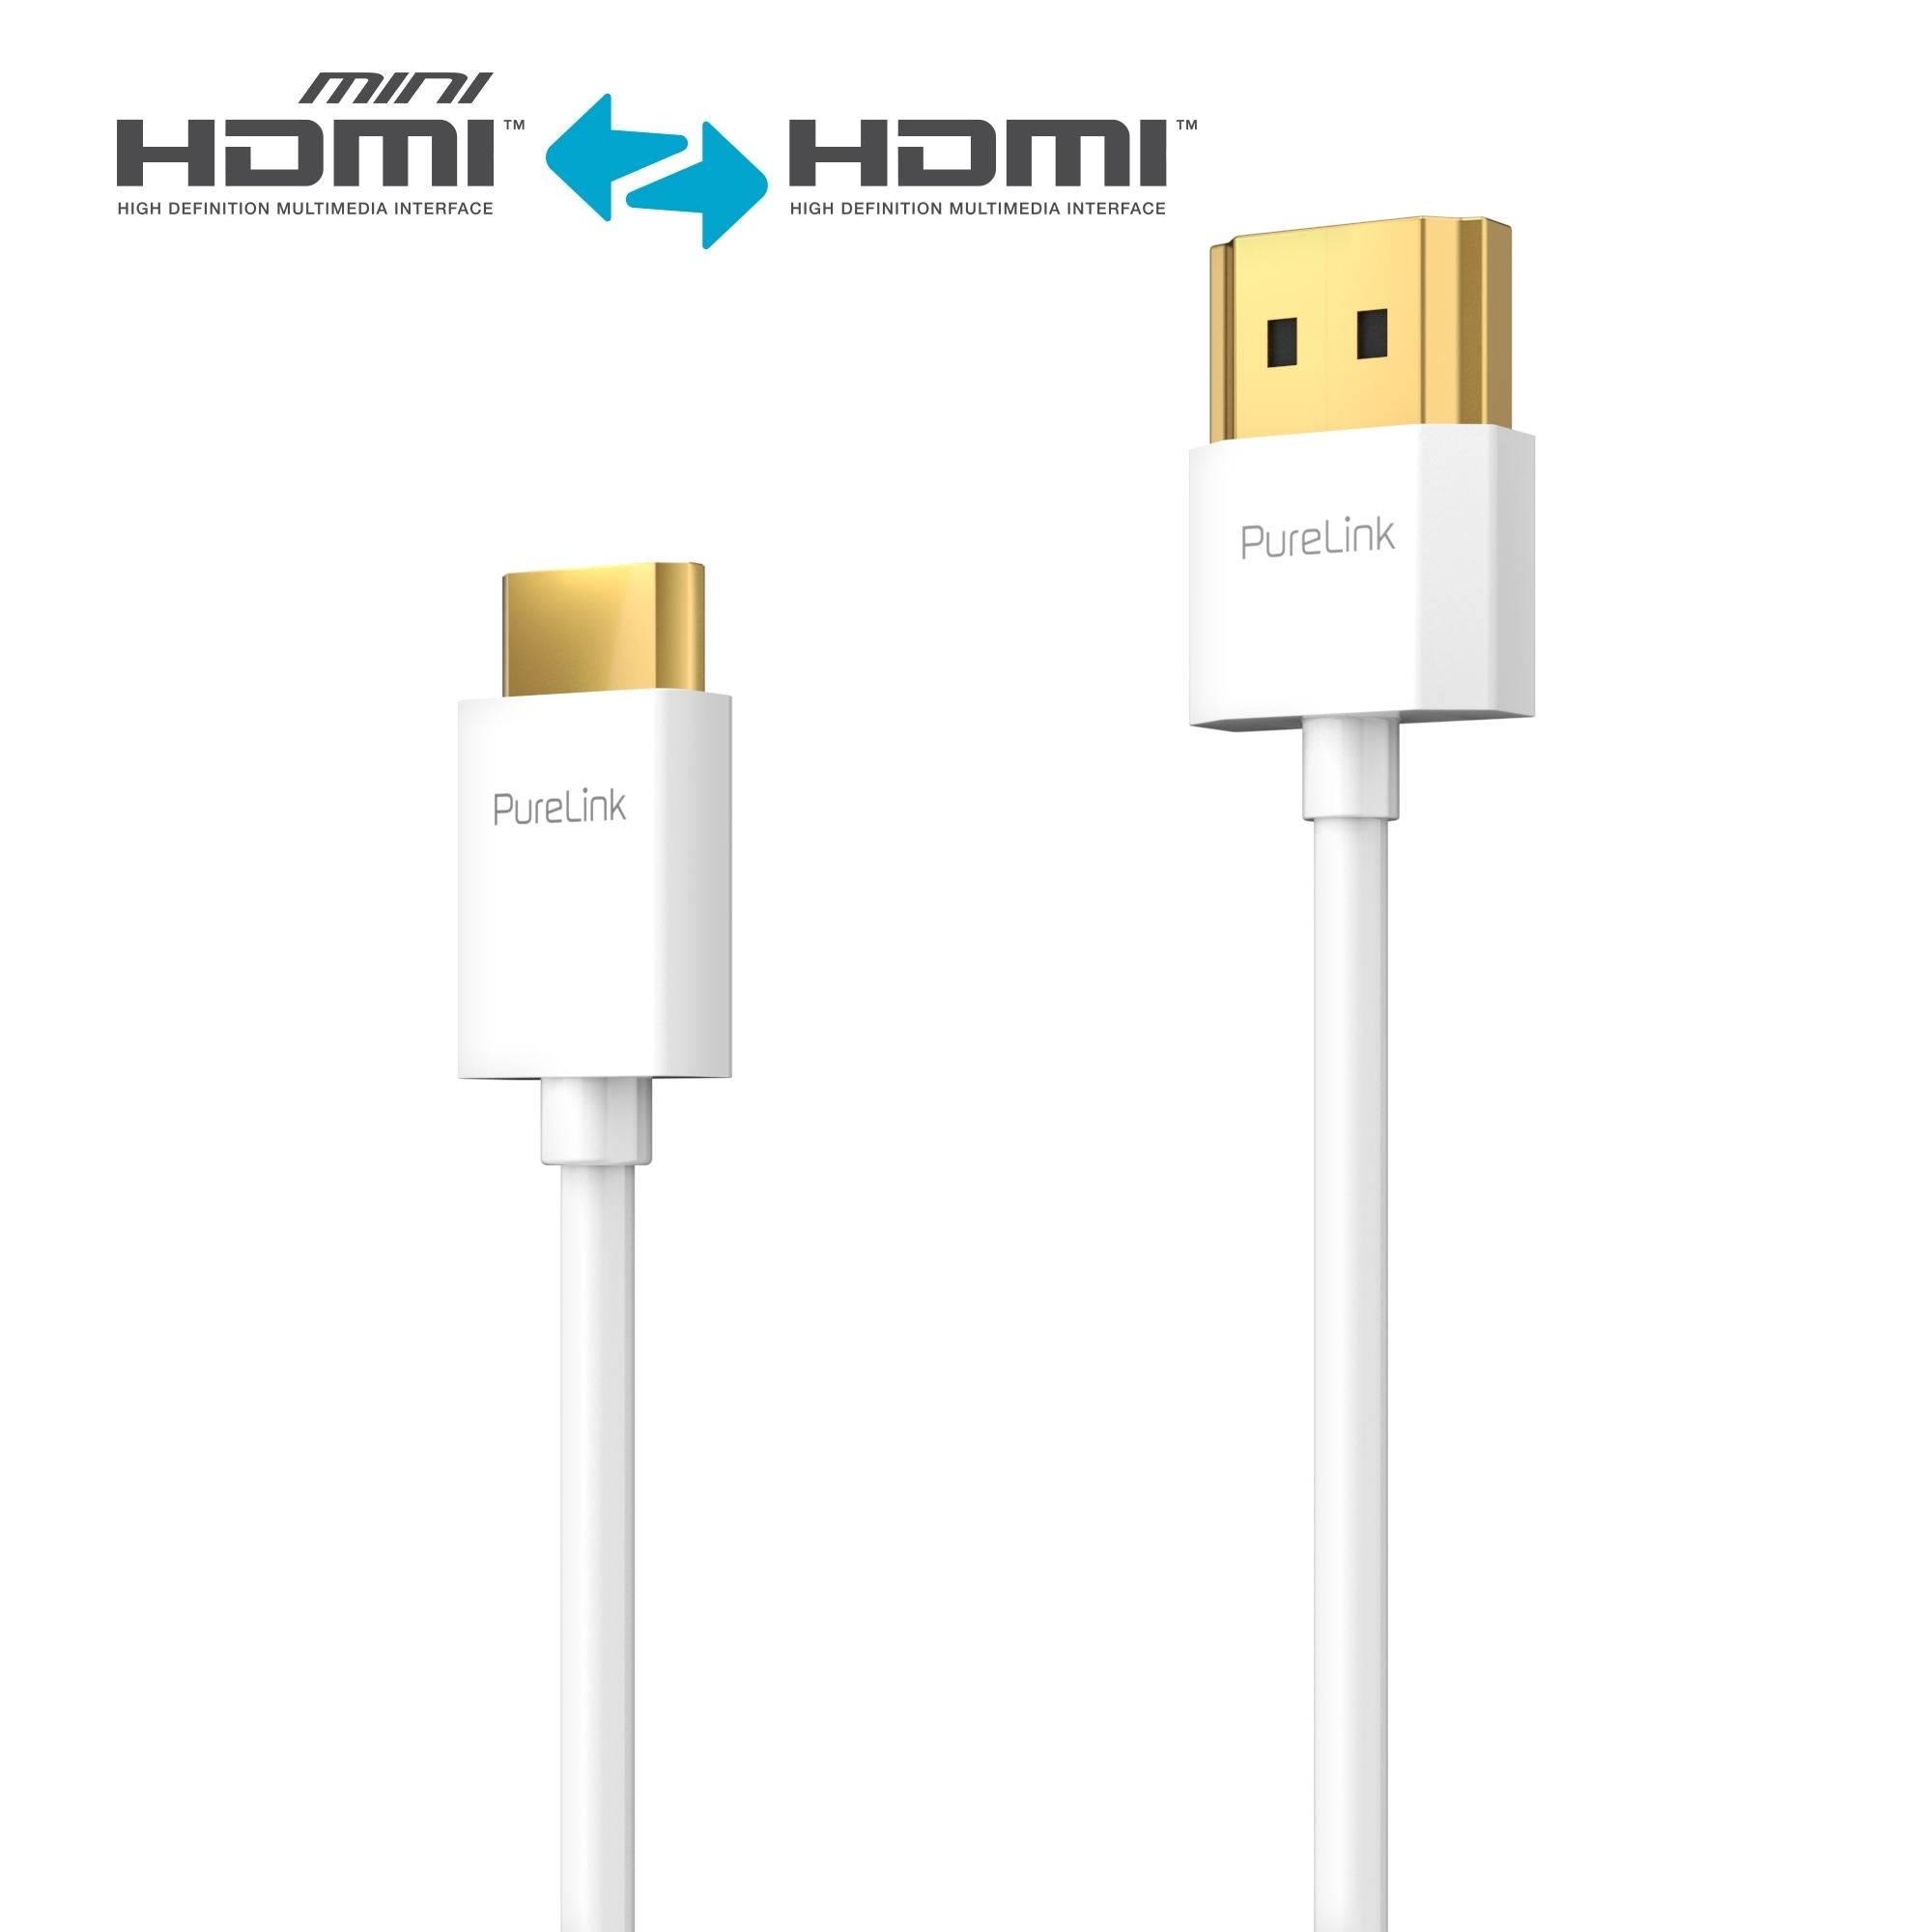 HDMI Mini HDMI Kabel ProSpeed Serie 1 50m Thin HDMI zu Mini HDMI Kabel HDMI Anschlusskabel eAV Deutschland AV Distribution